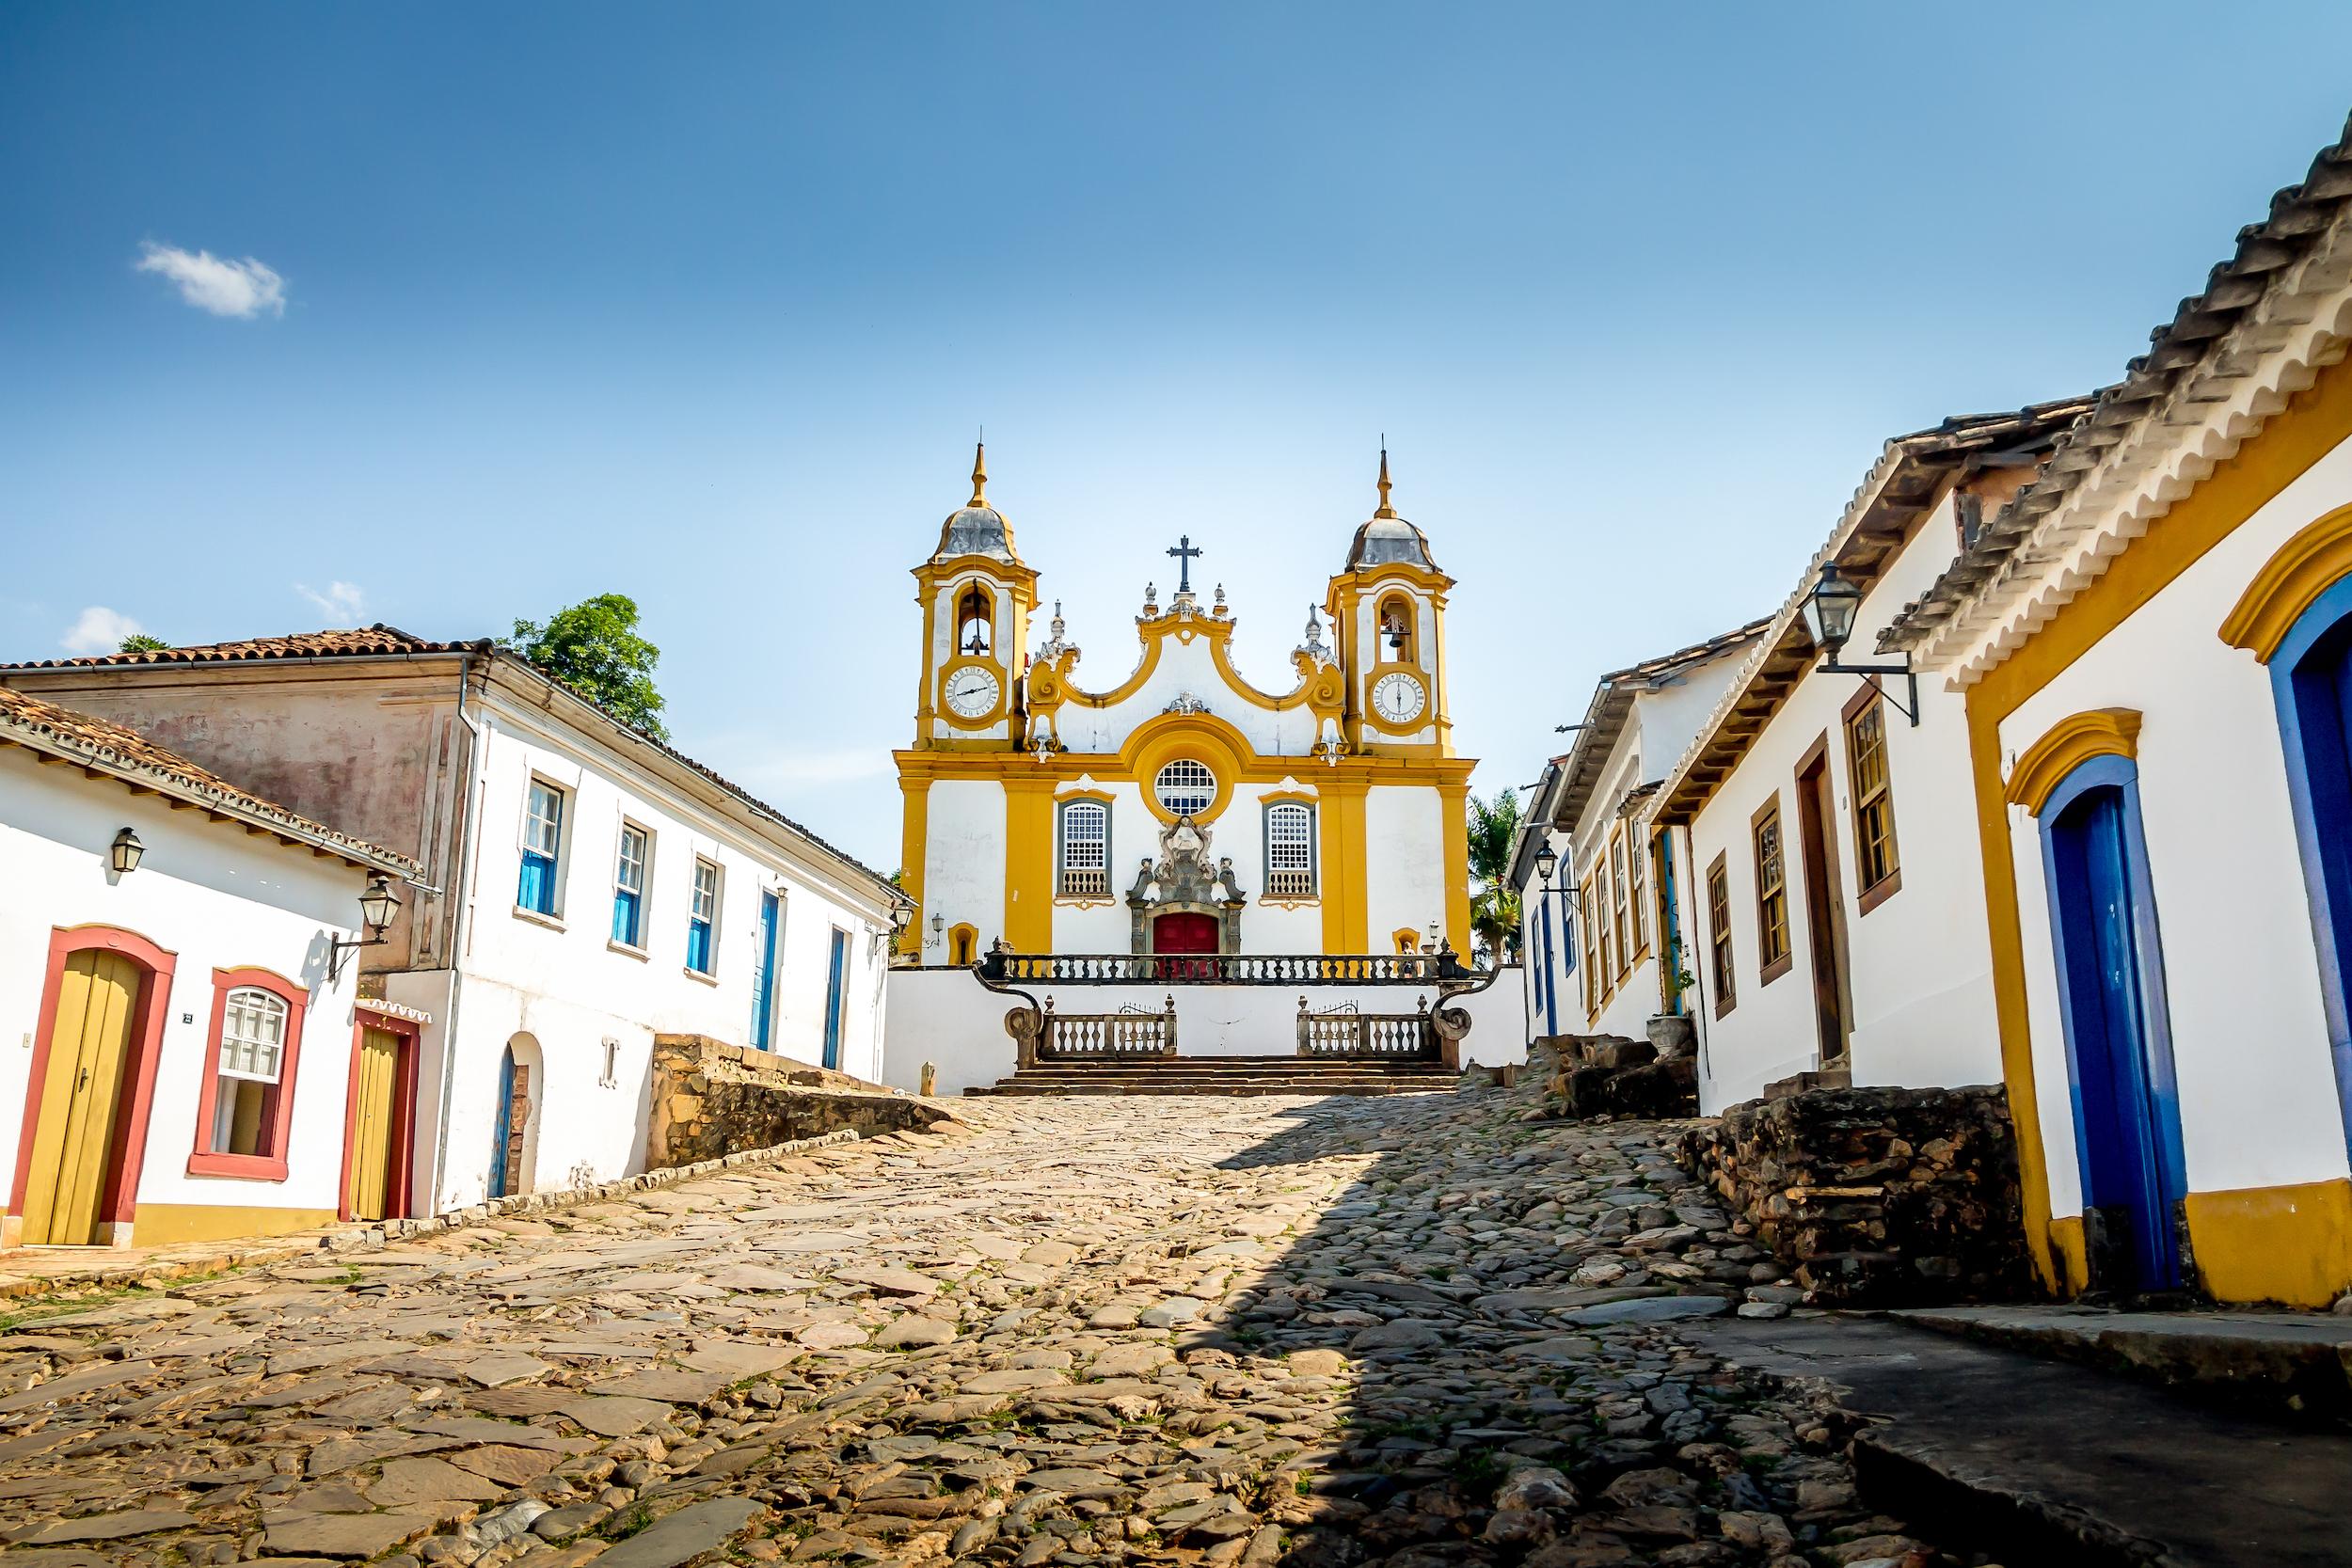 PVT Bresil - Tiradentes - Minas Gerais